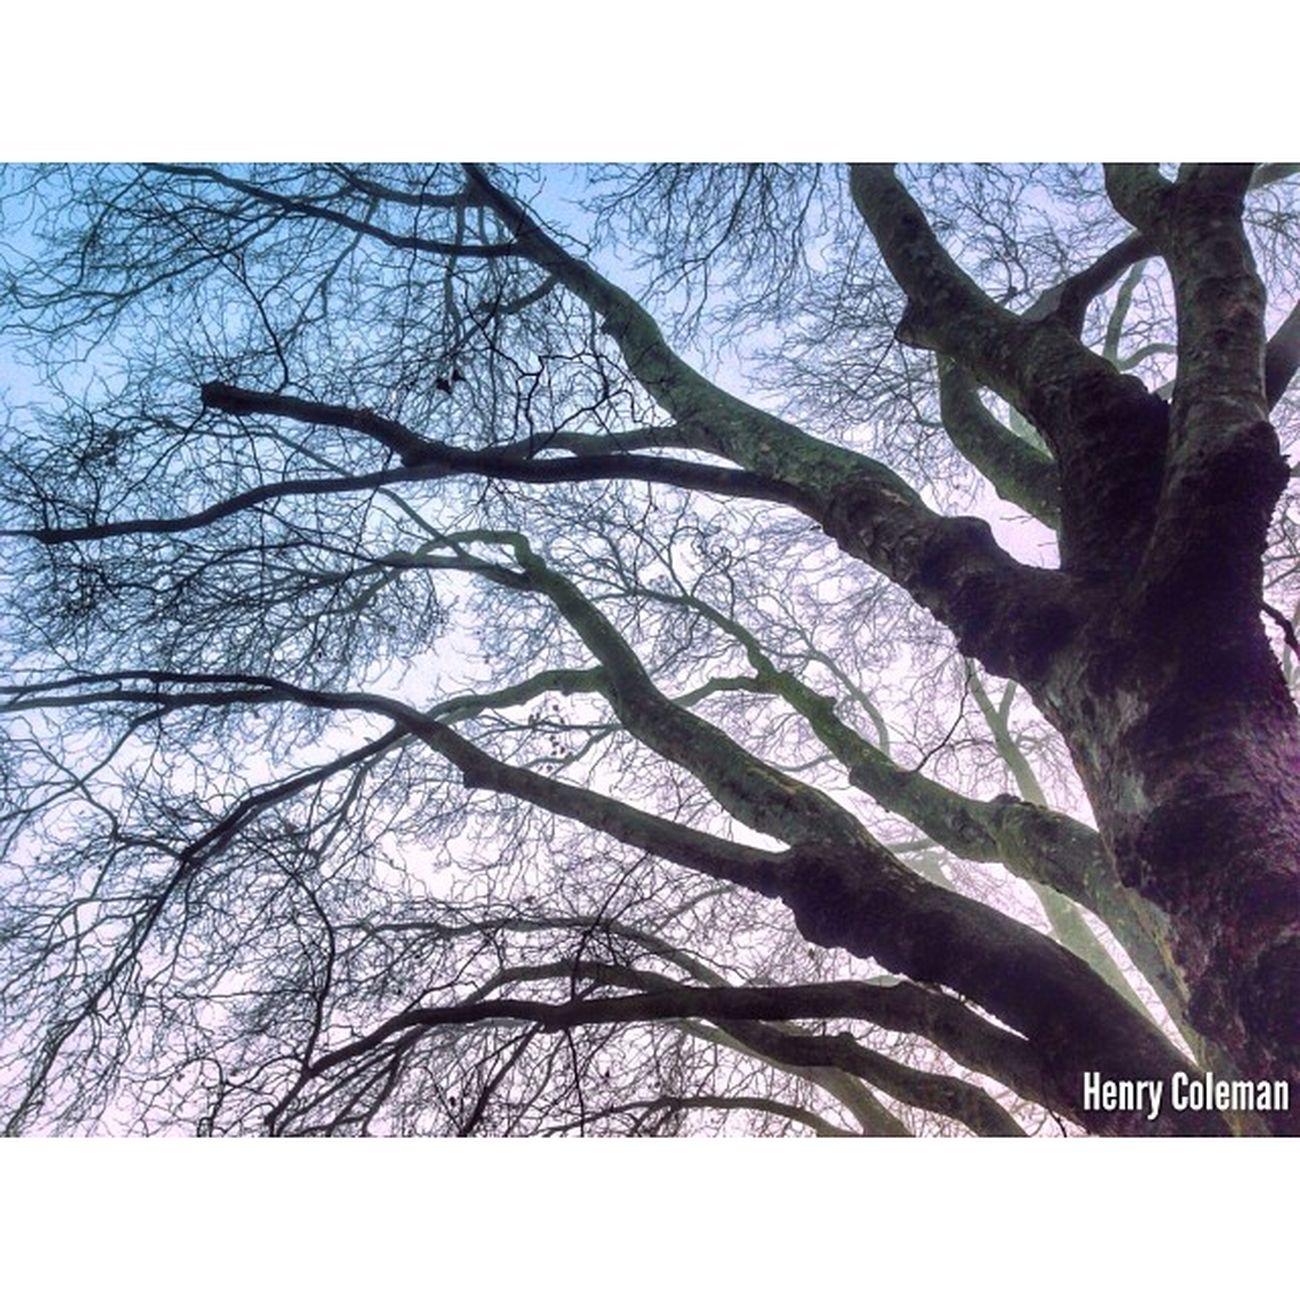 """Knocking on the Sky"" London London_only Londonpop Udog_edit Ig_europe Ig_exquisite Udog_peopleandplaces Shotaward Squarevision Icu_britain The_photographers_emporium Udog_nature Udog_sky"